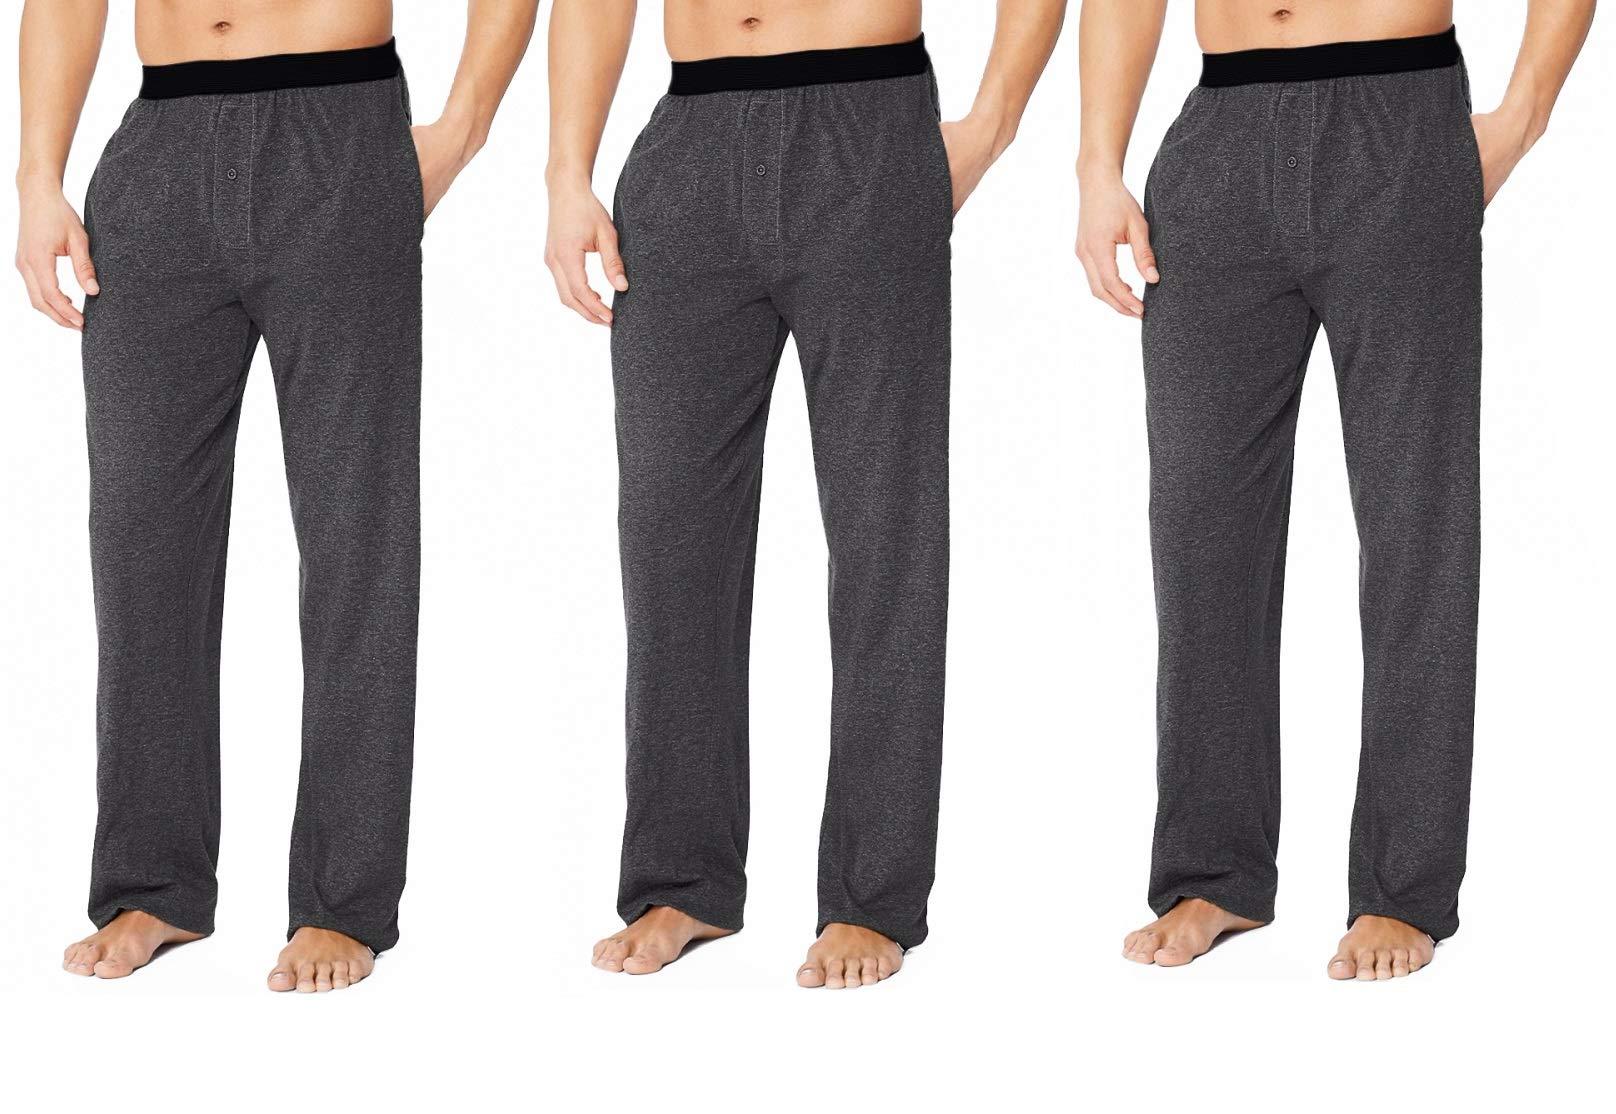 Ecko (3 Pack) Cool Knit Sleep Pajama Pants for Men Pajamas Soft Lounge Pants PJs